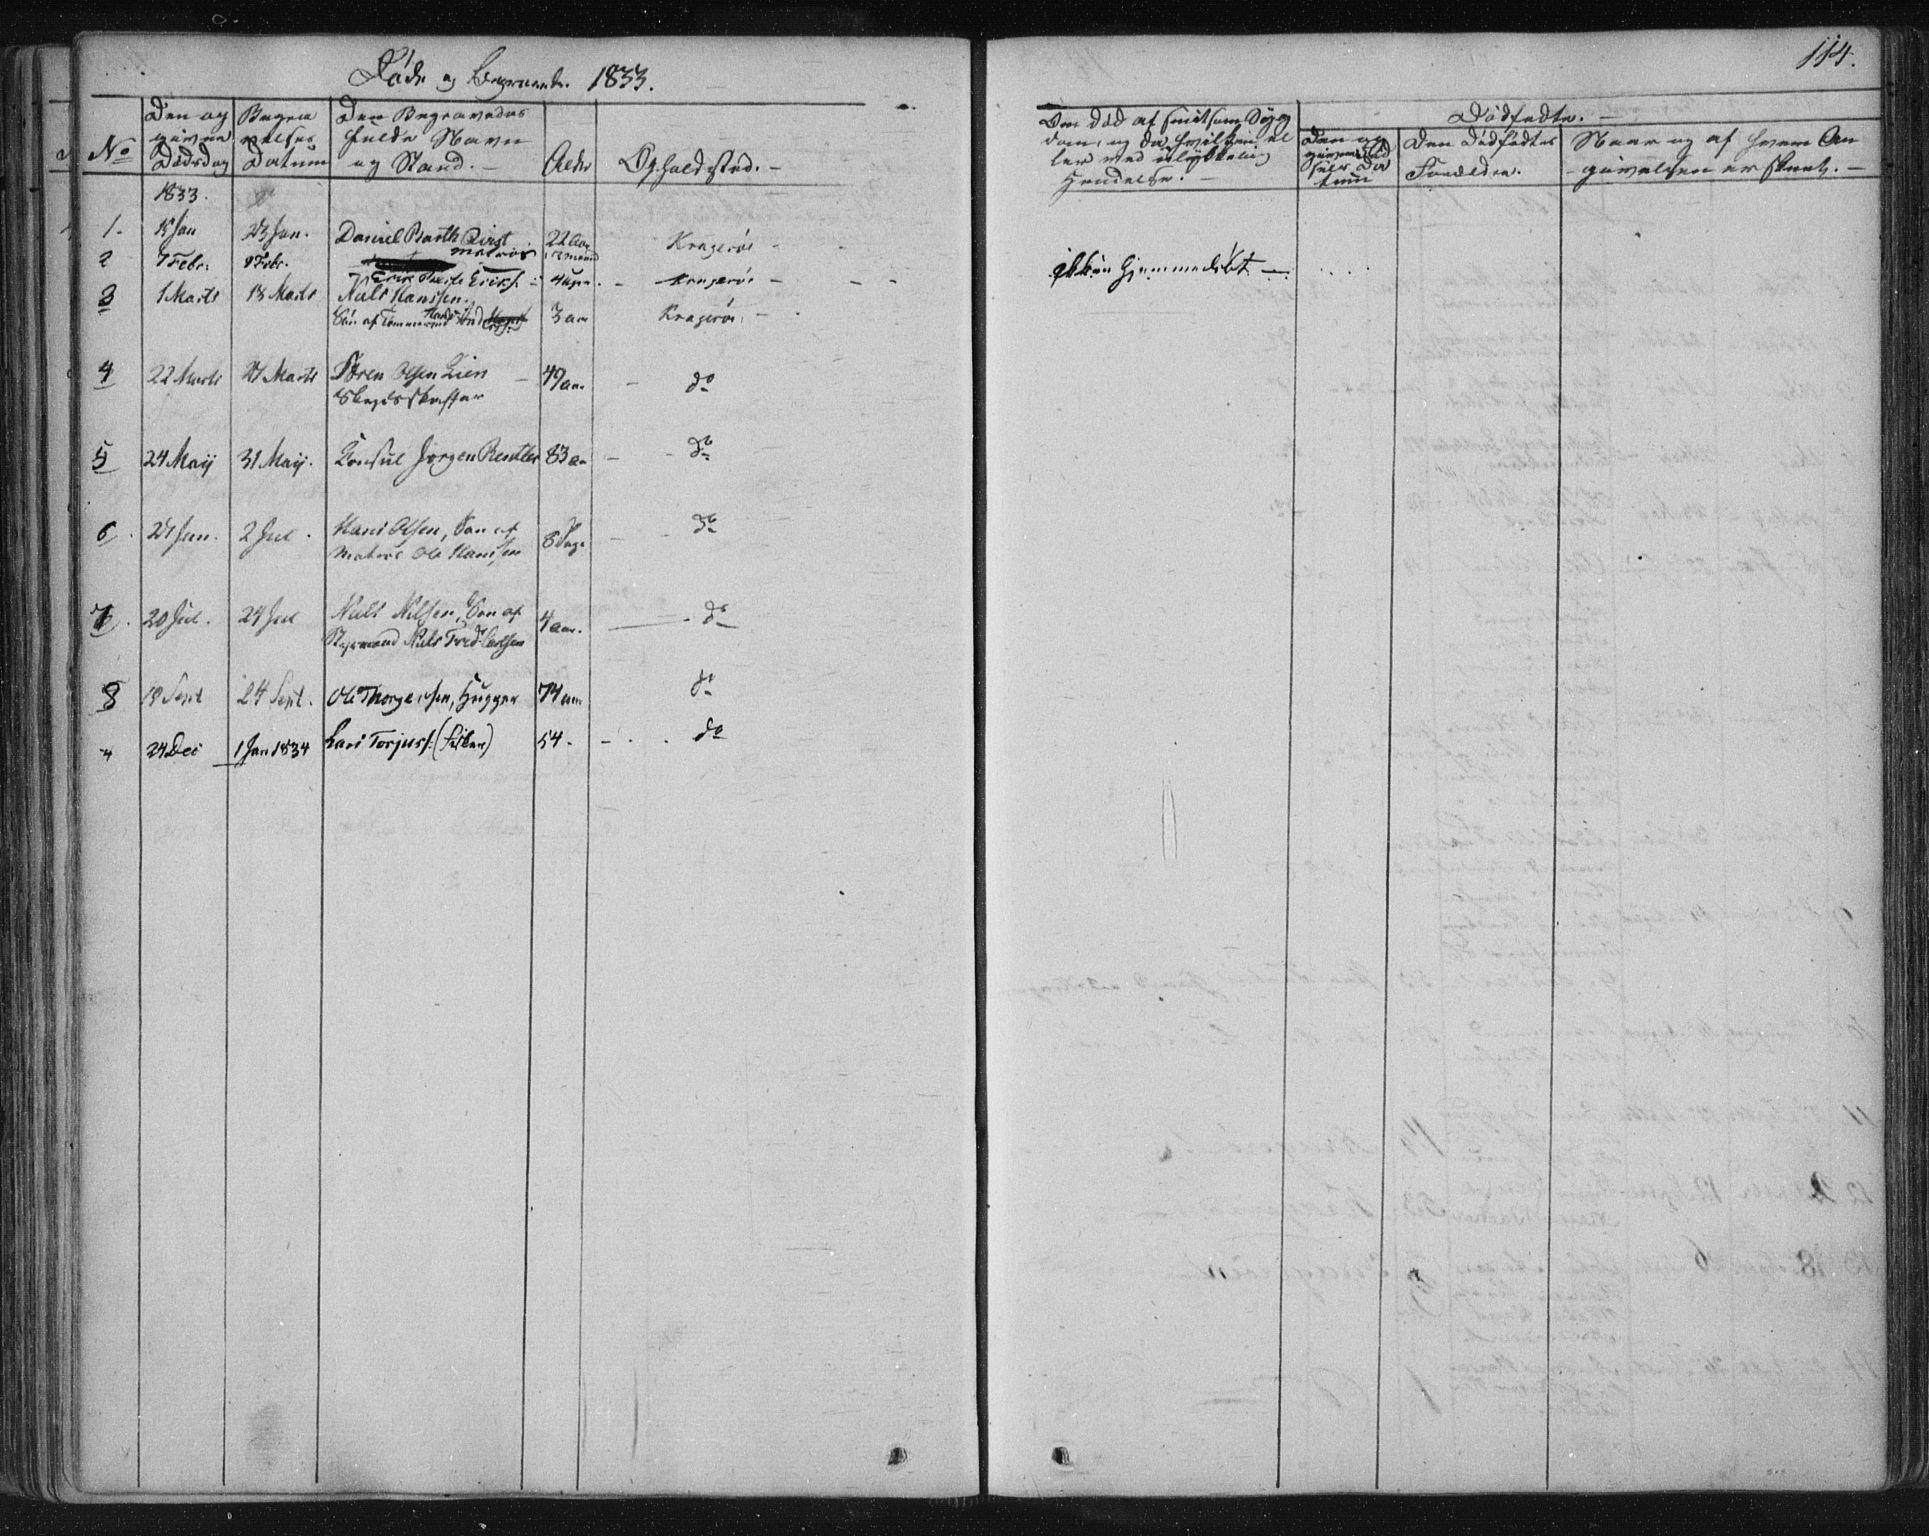 SAKO, Kragerø kirkebøker, F/Fa/L0005: Ministerialbok nr. 5, 1832-1847, s. 114